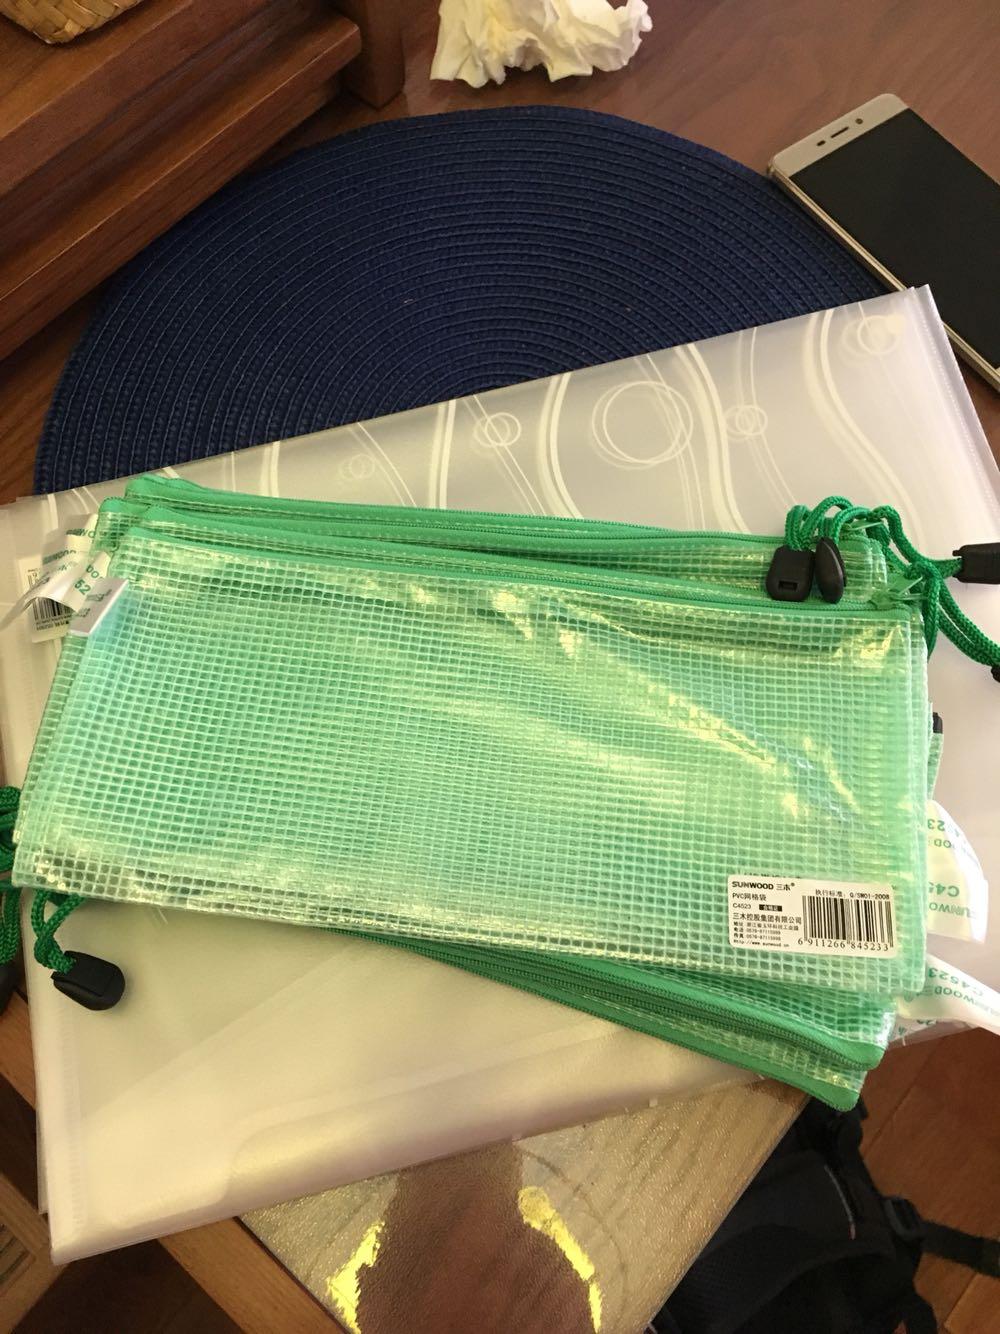 satchels bags for women 00291000 women